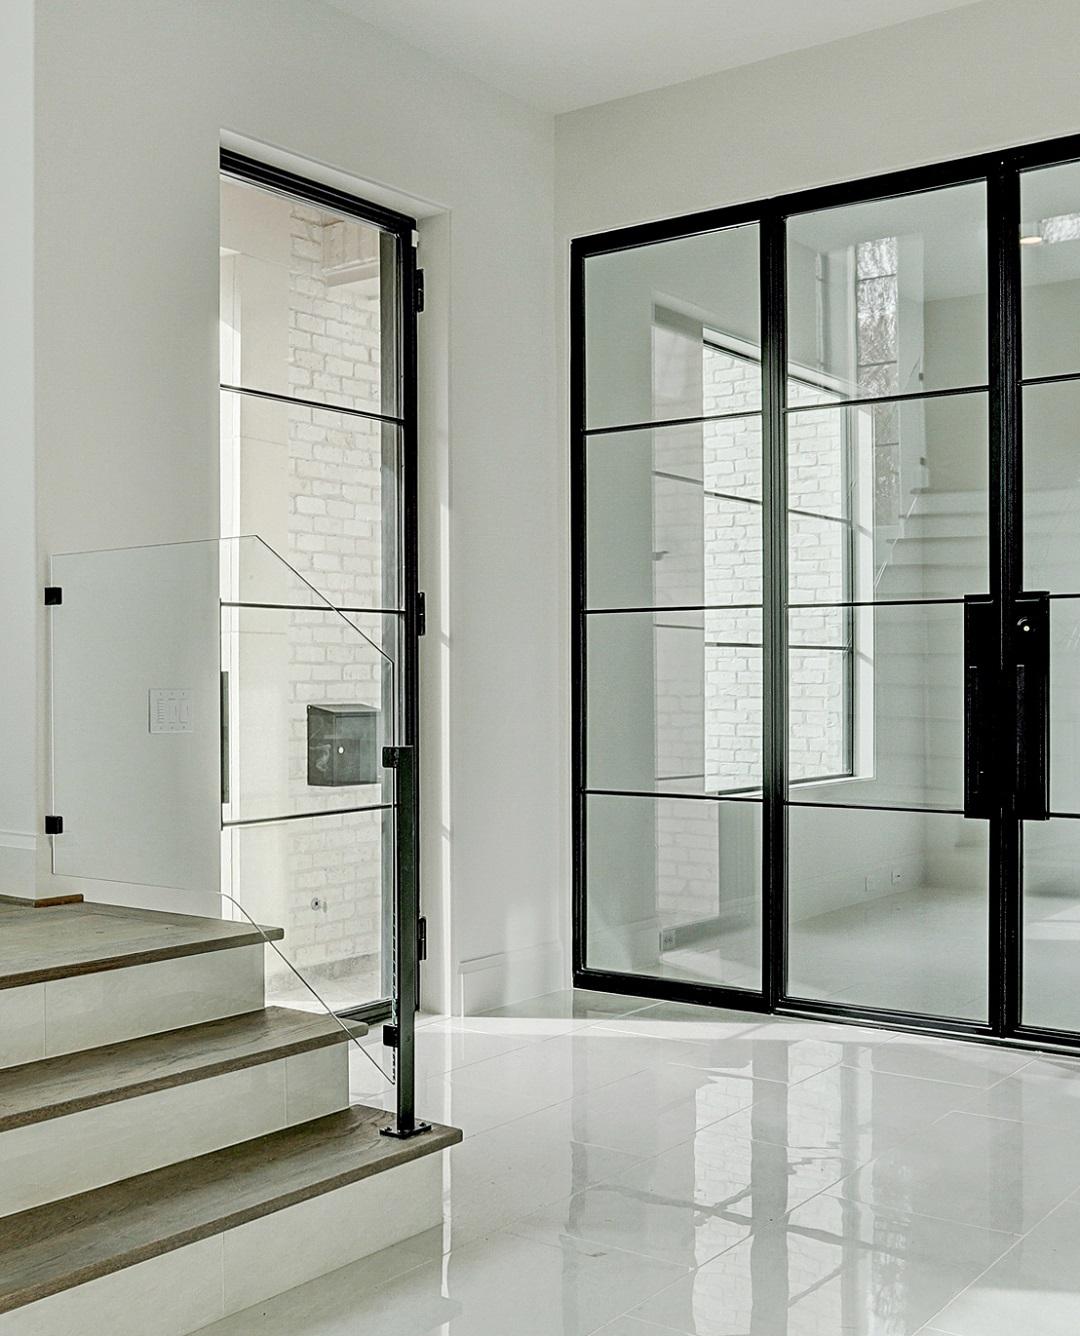 Matching glass walls with exterior Door